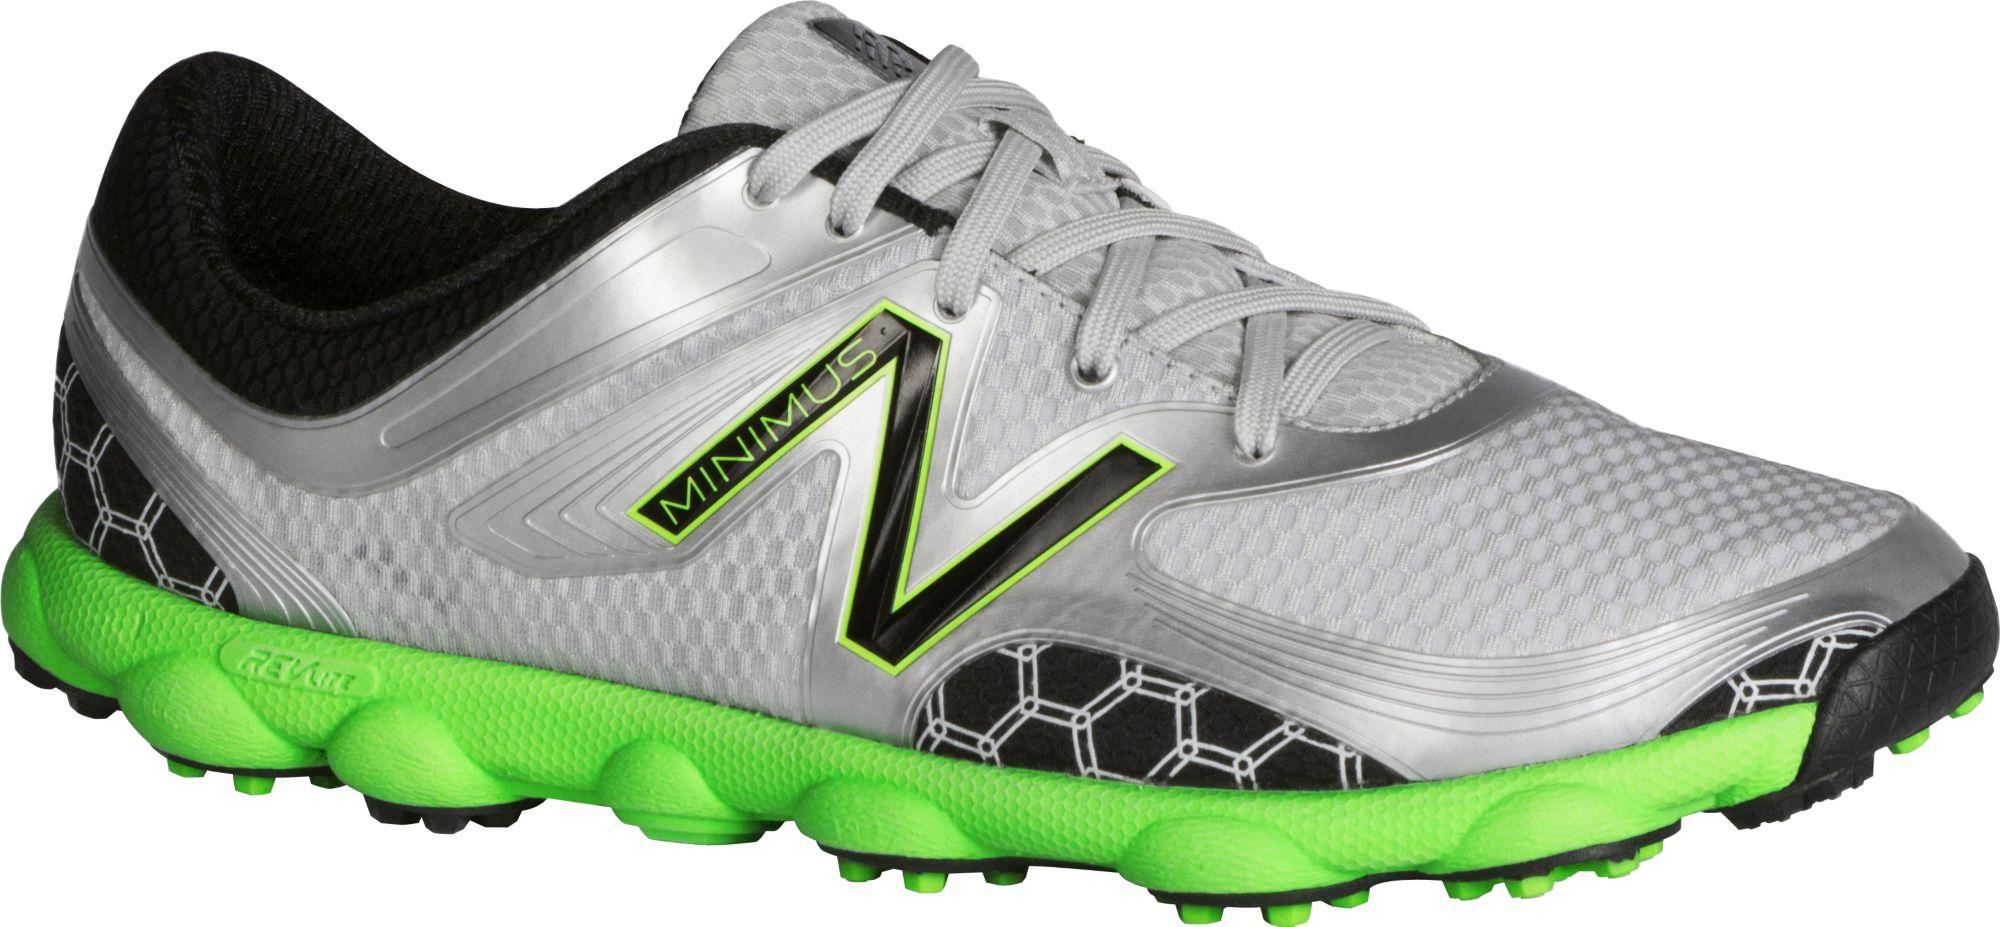 New Balance Minimus Sport Golf Shoes